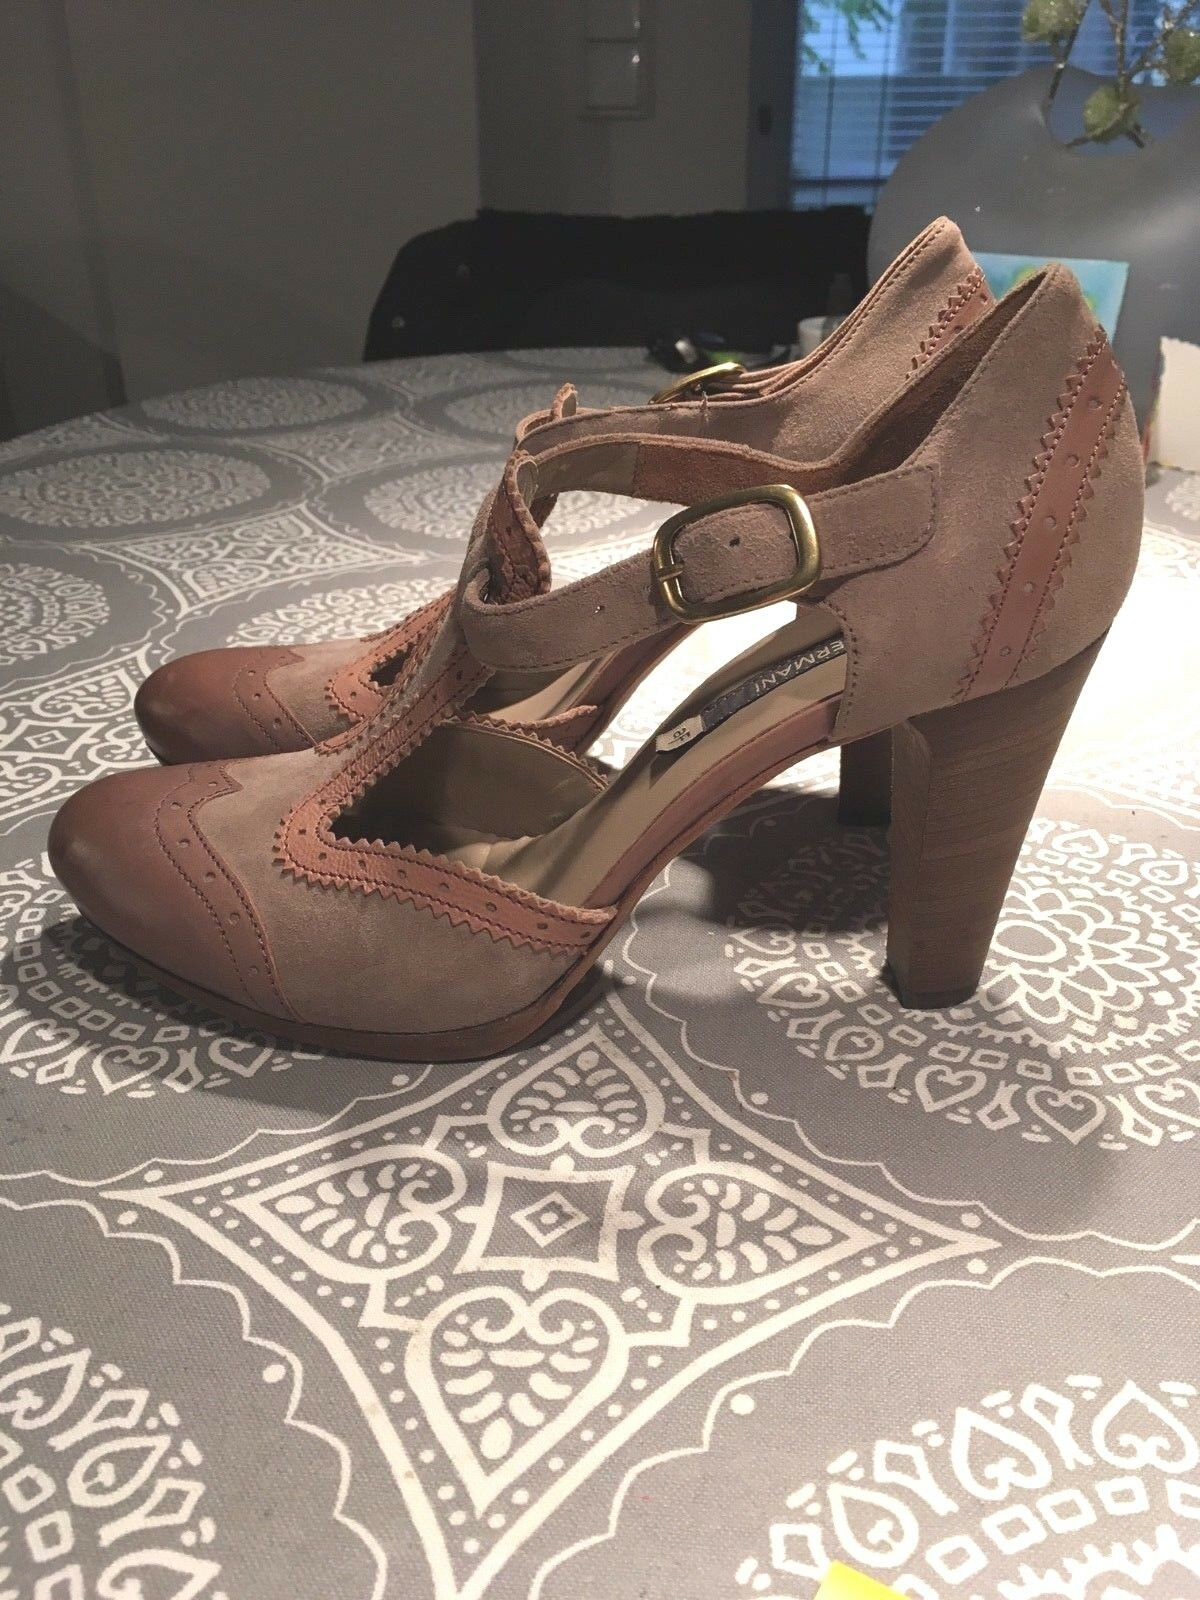 ALBERTO FERMANI, wunderschöne Schuhe, neu, Größe 39 (D)